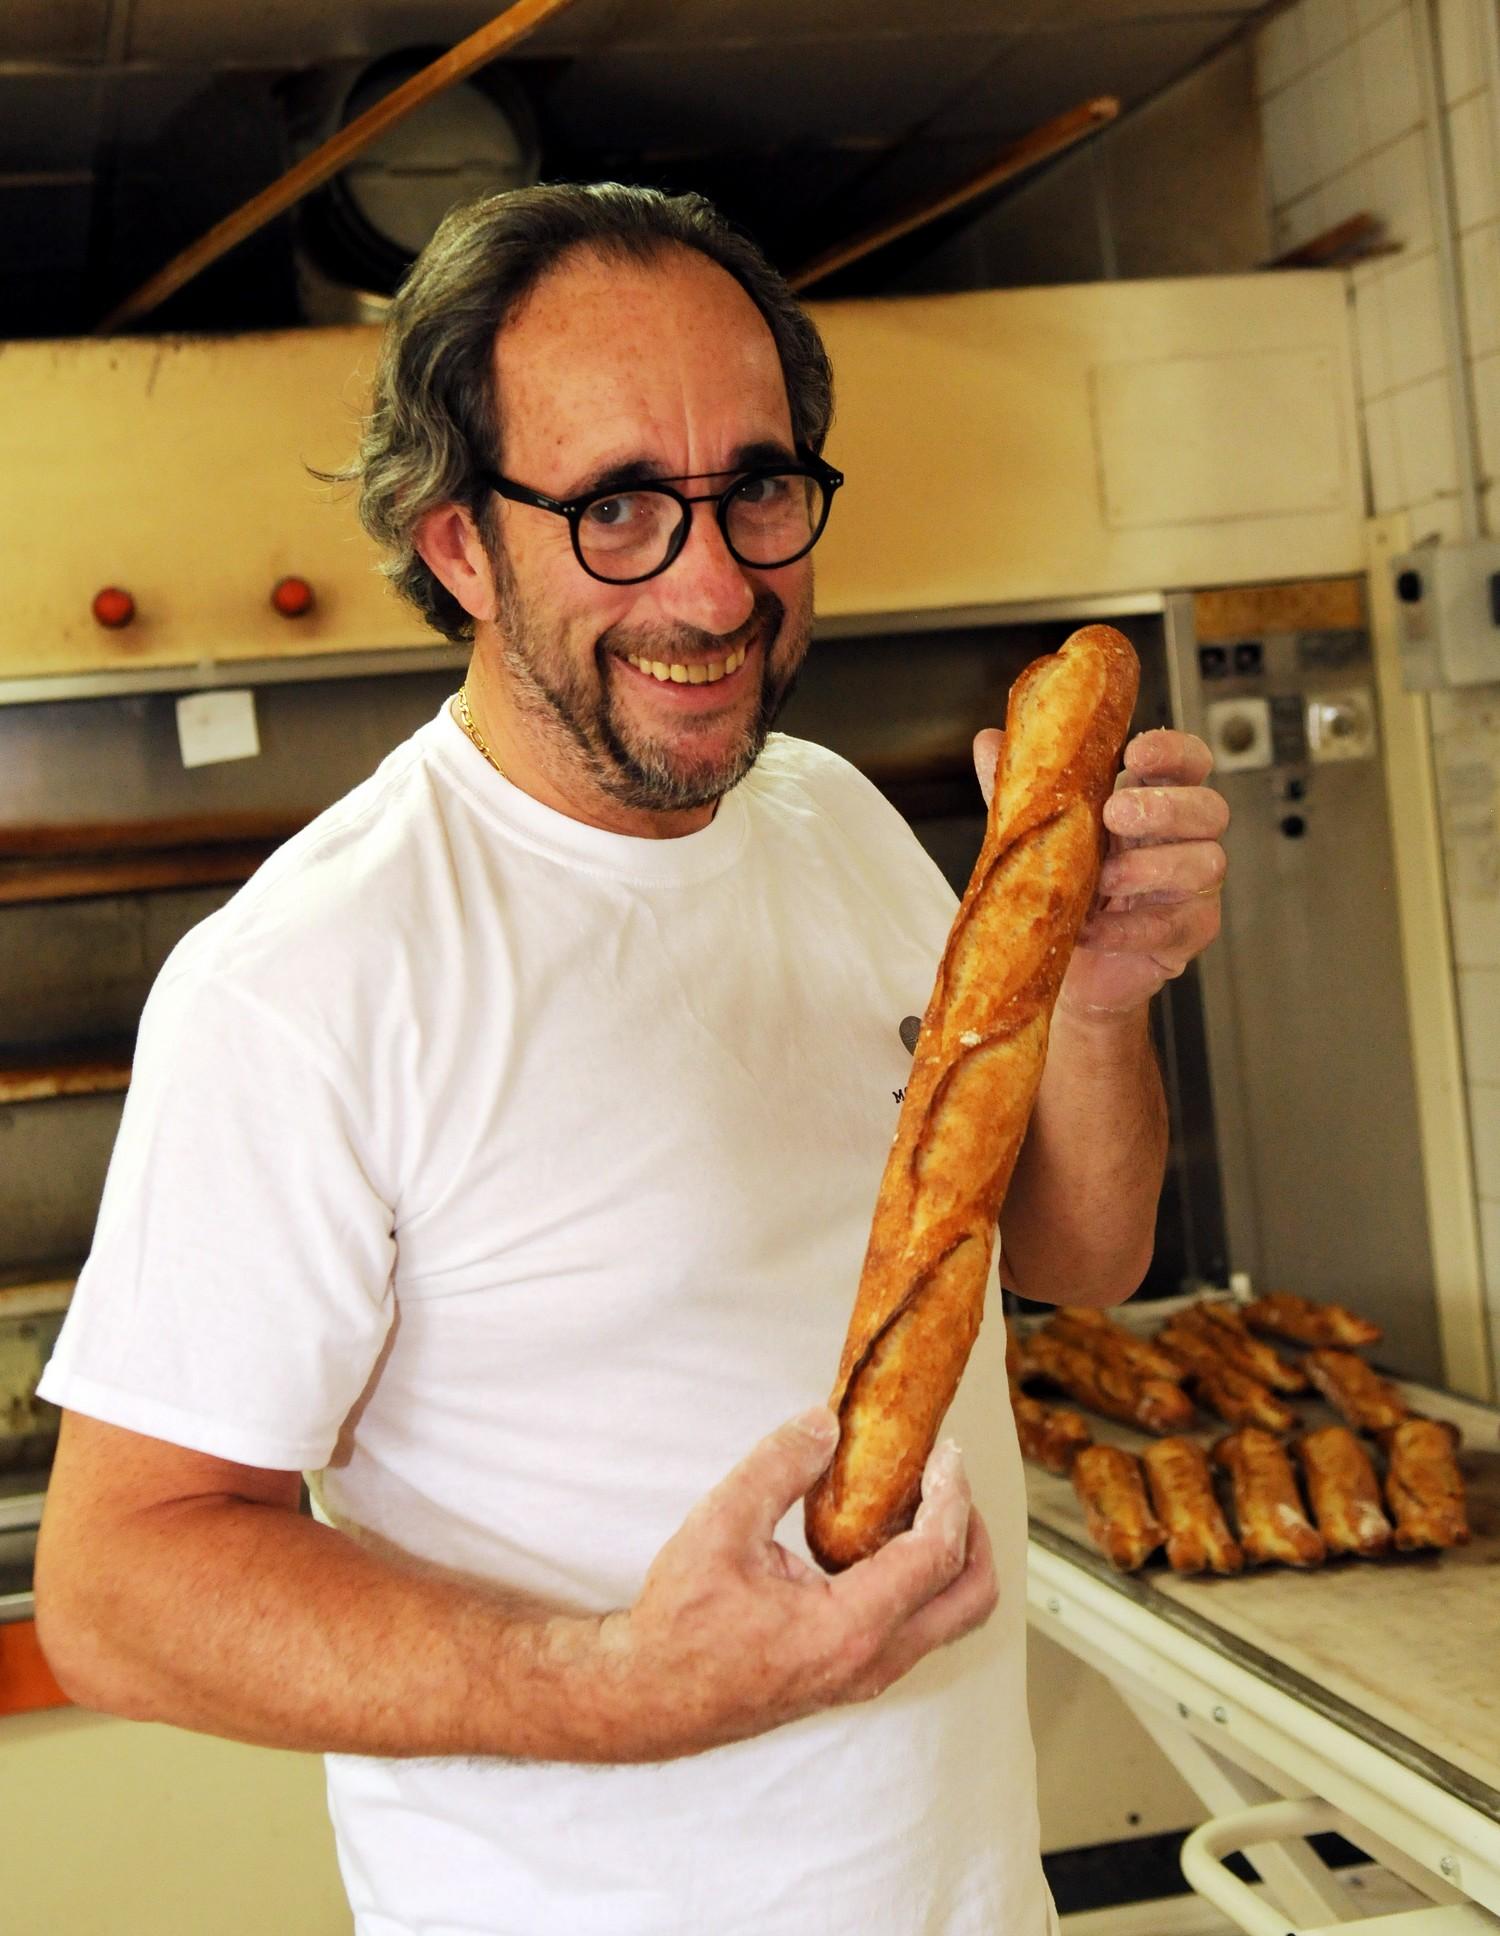 GAUTHIER Frédéric pâtissier boulanger Val d'Oise ©JC.Boudet